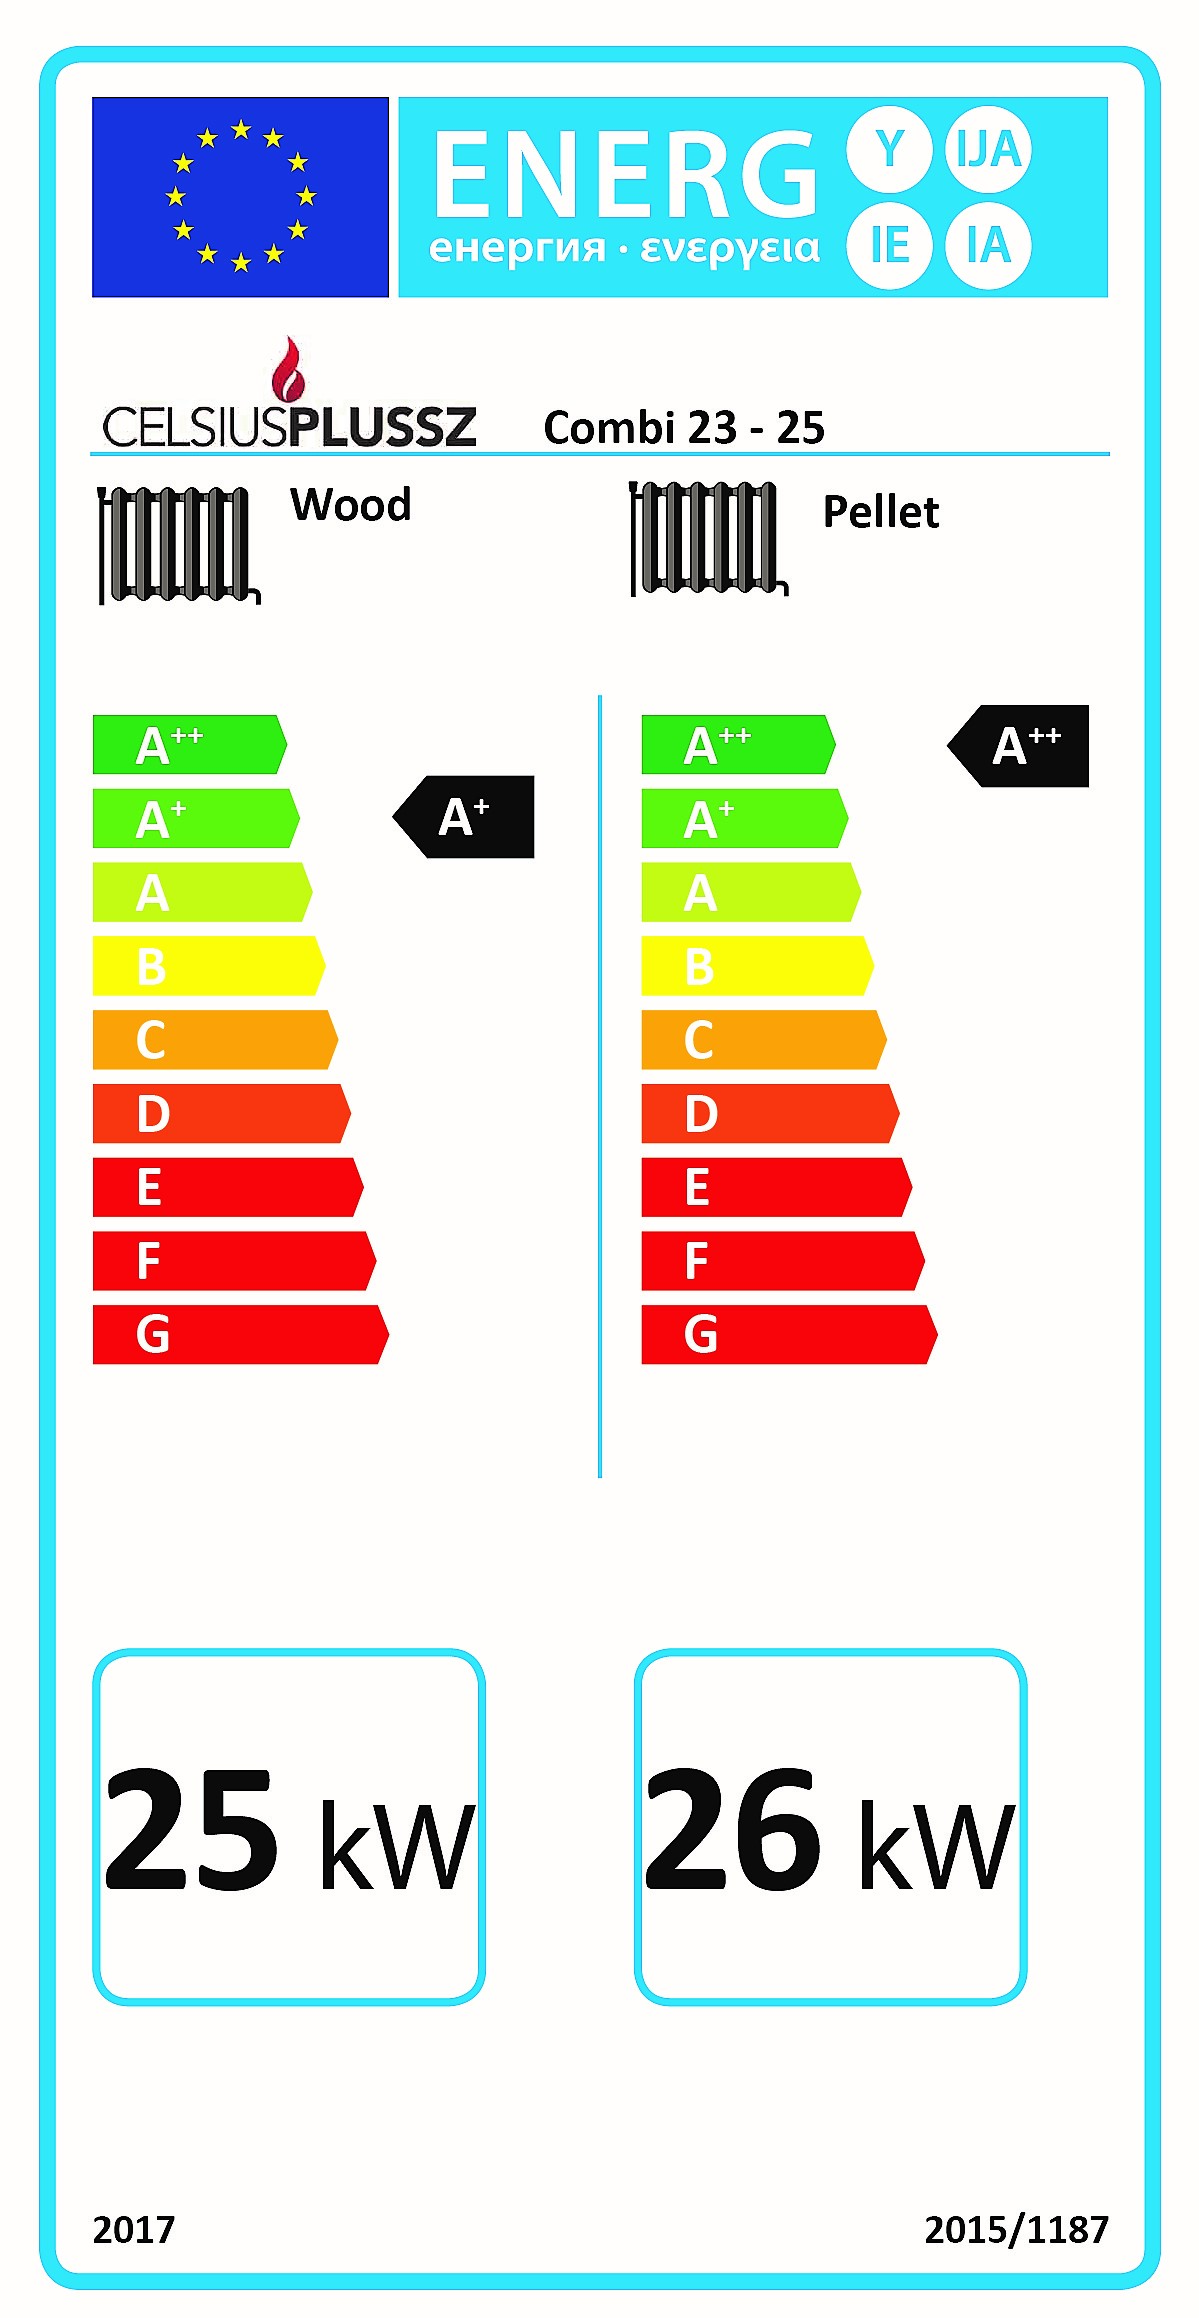 Celsius Combi energiacímke